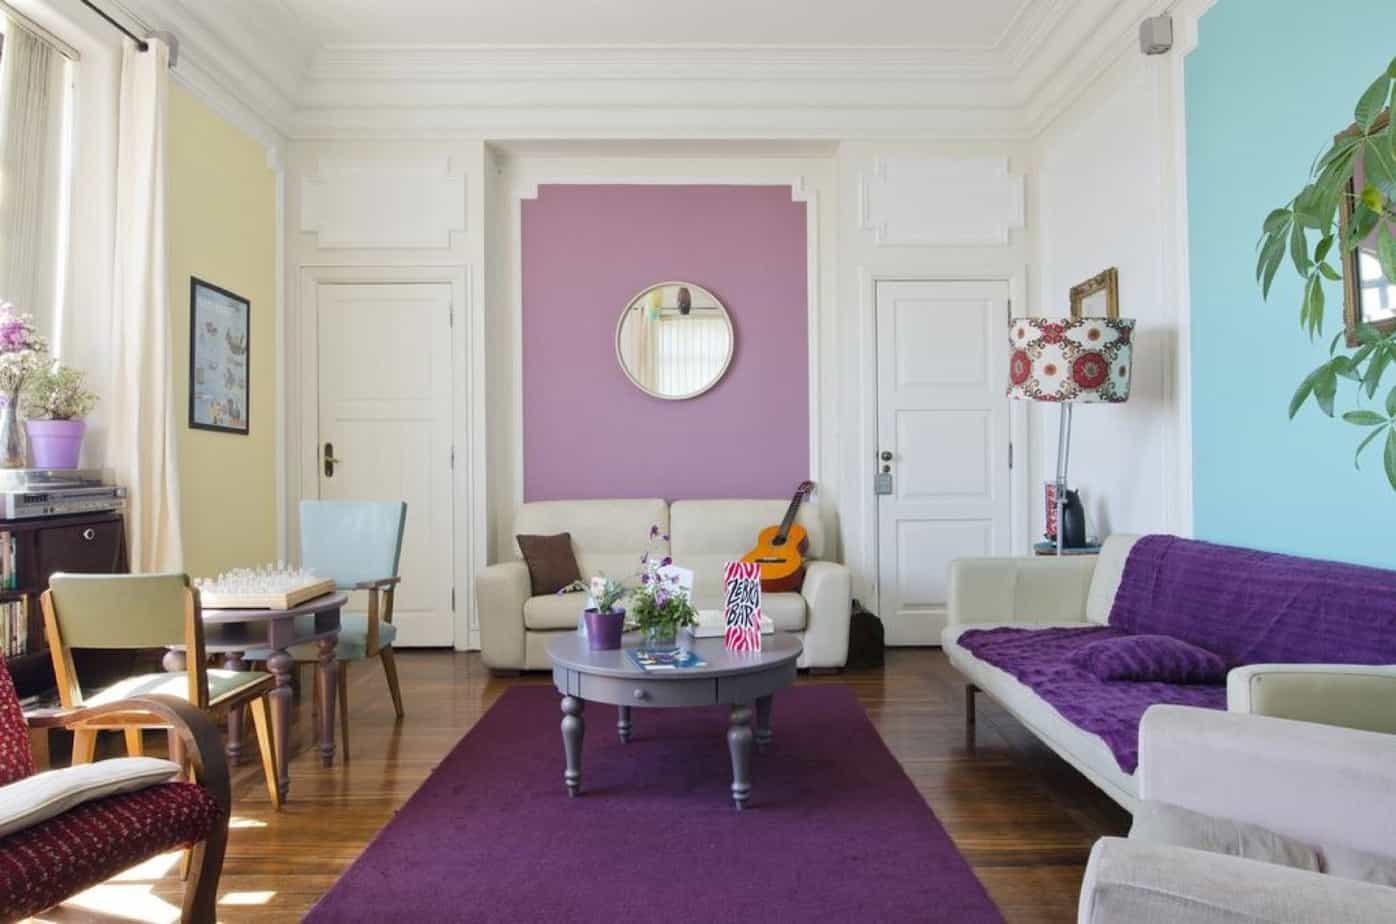 Top 26 Mẫu Thiết Kế Nội Thất Tây Âu Đẹp Ấn Tượng Nhất -  - Mẫu thiết kế nội thất đẹp | Nội thất phong cách tây âu 79